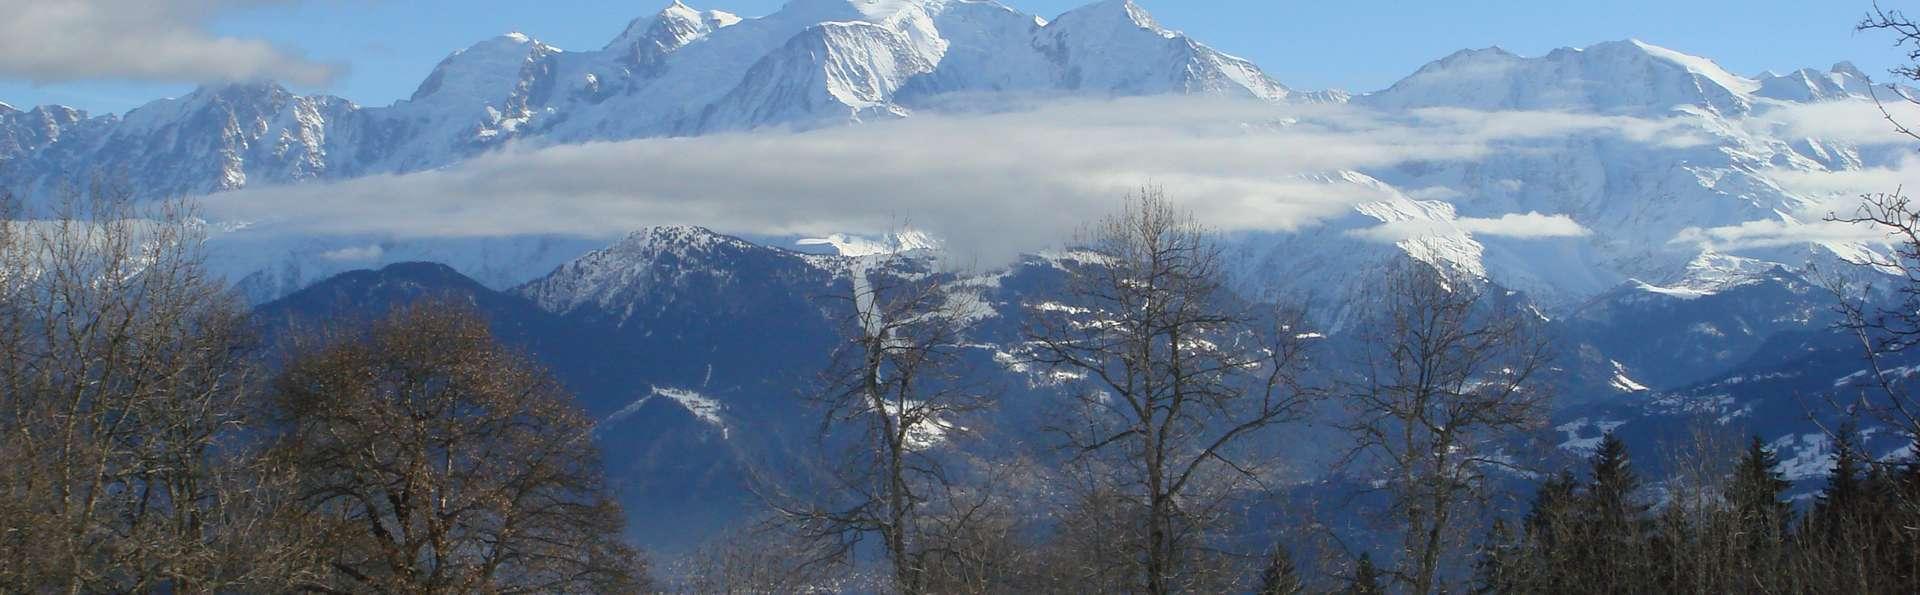 Cairn - cairn_montagne1.JPG